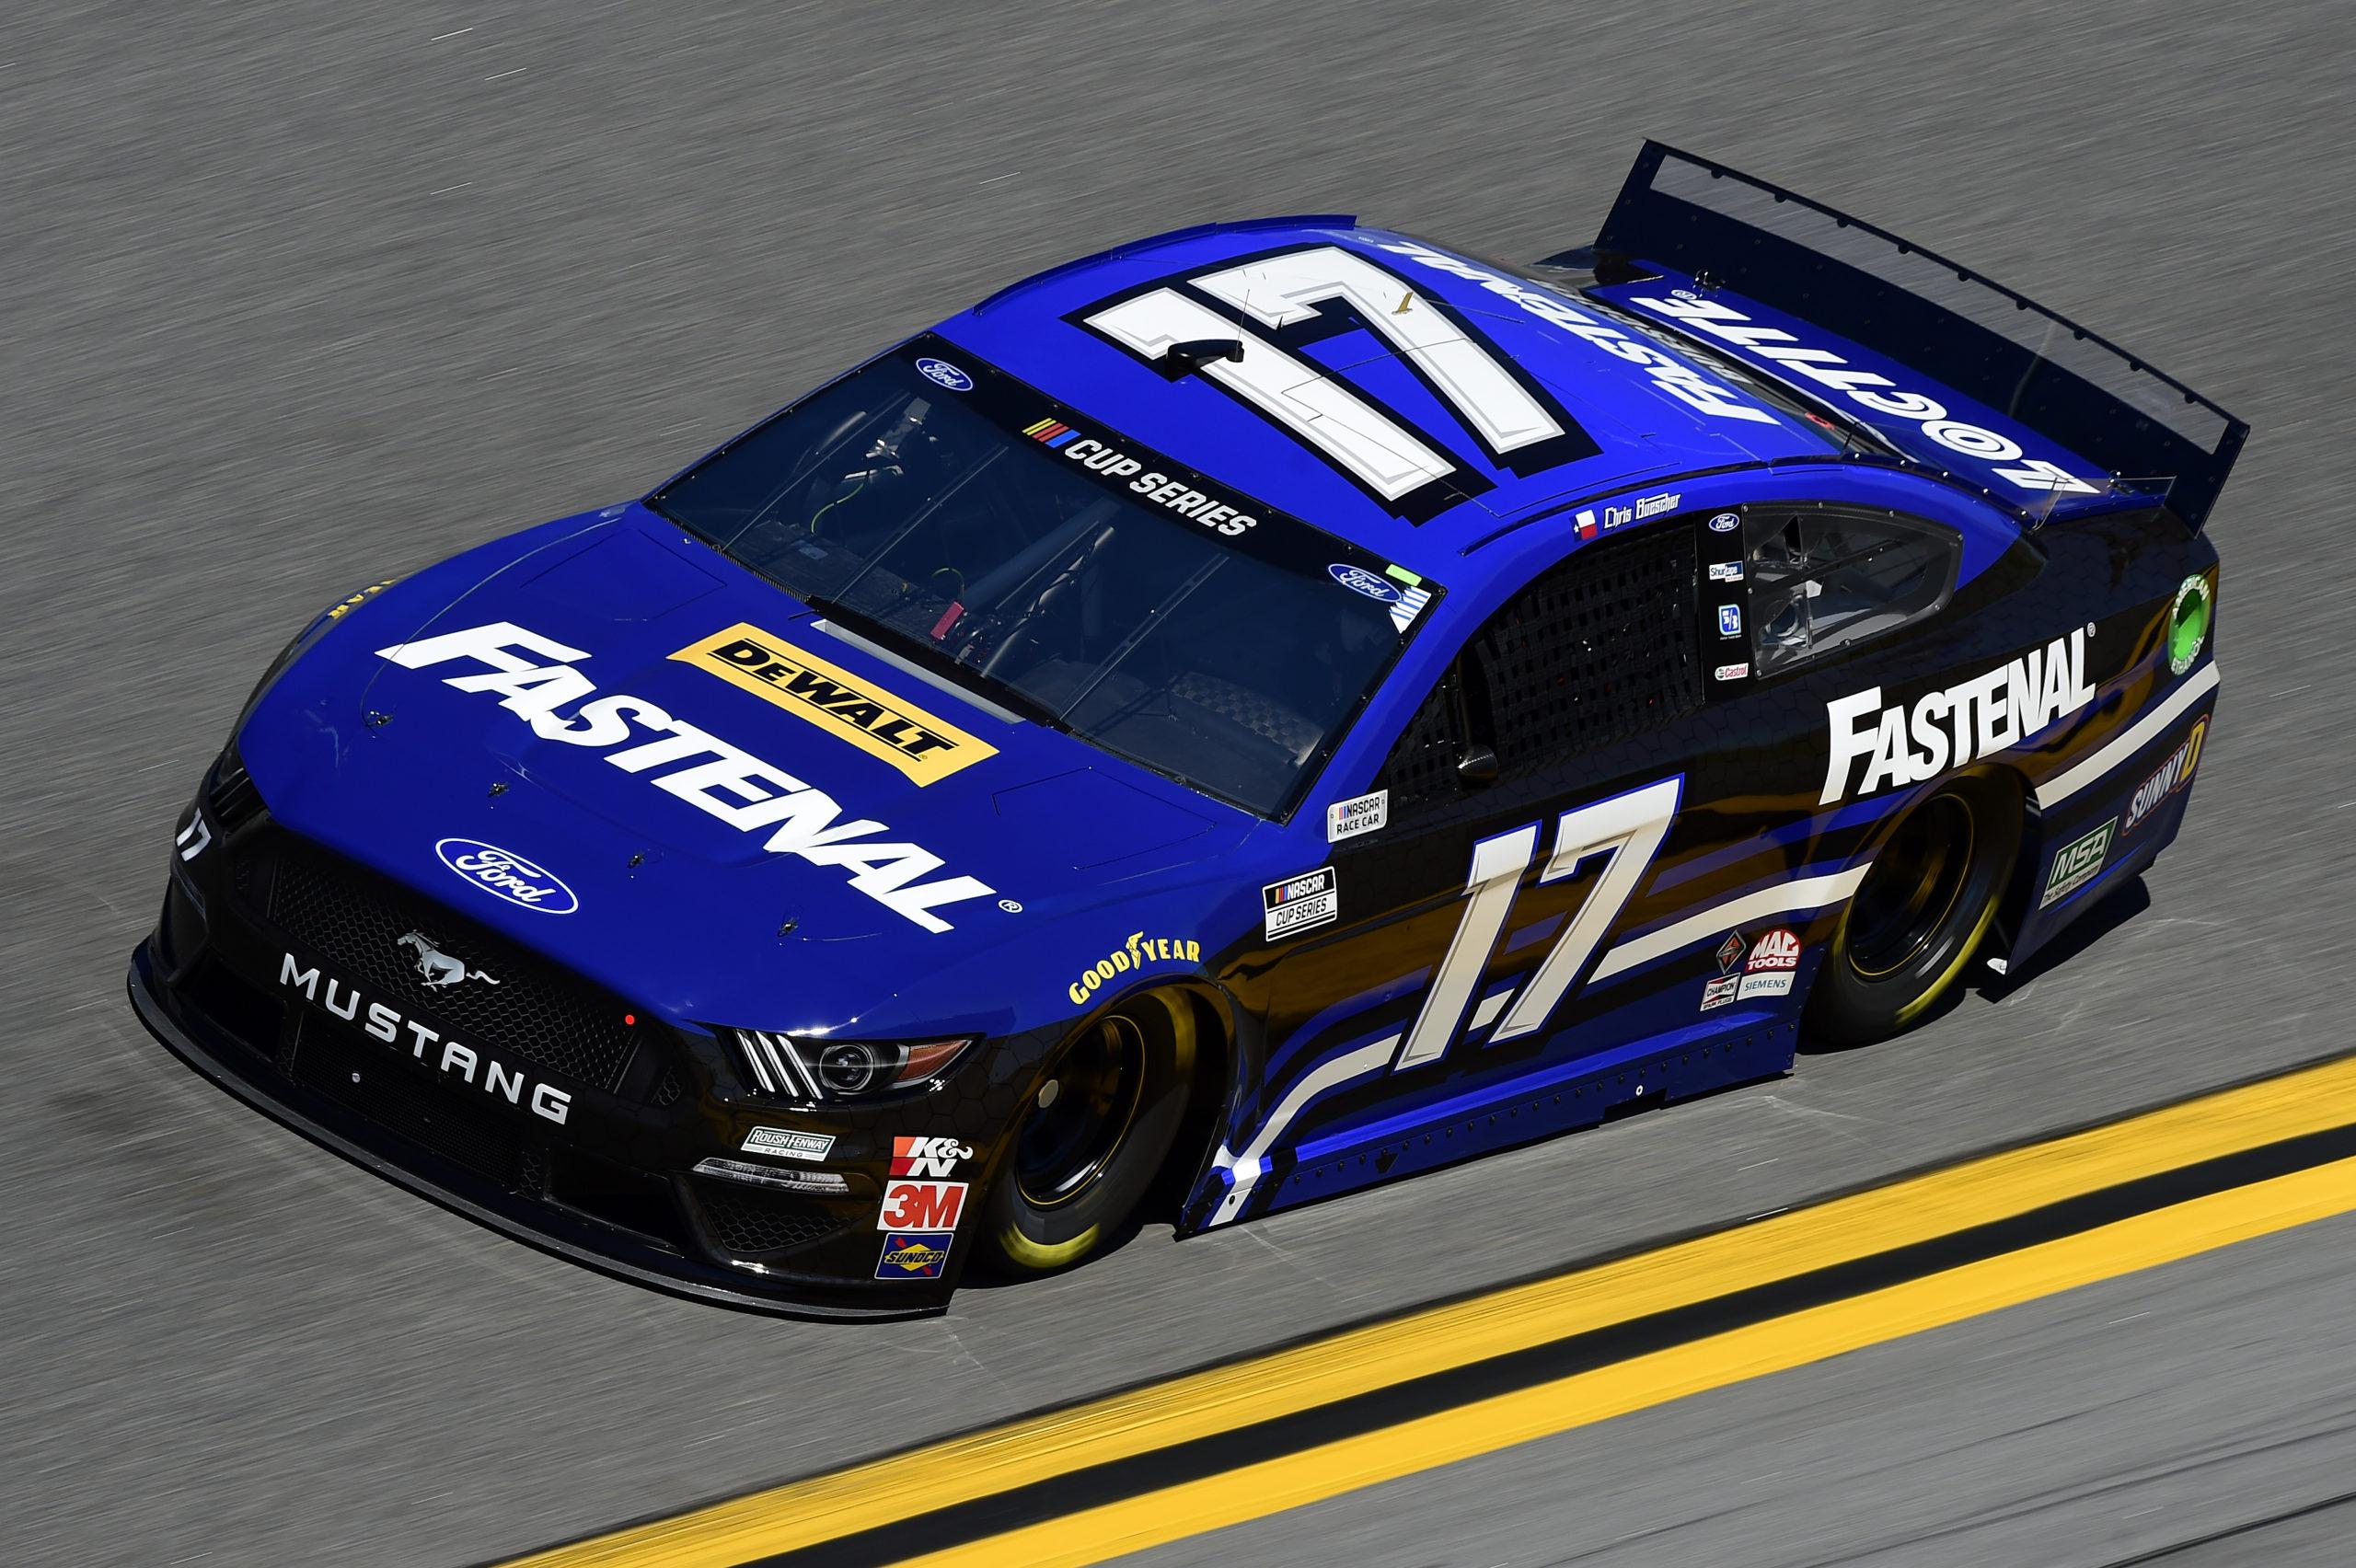 2021 NASCAR Preview: Roush Fenway Racing